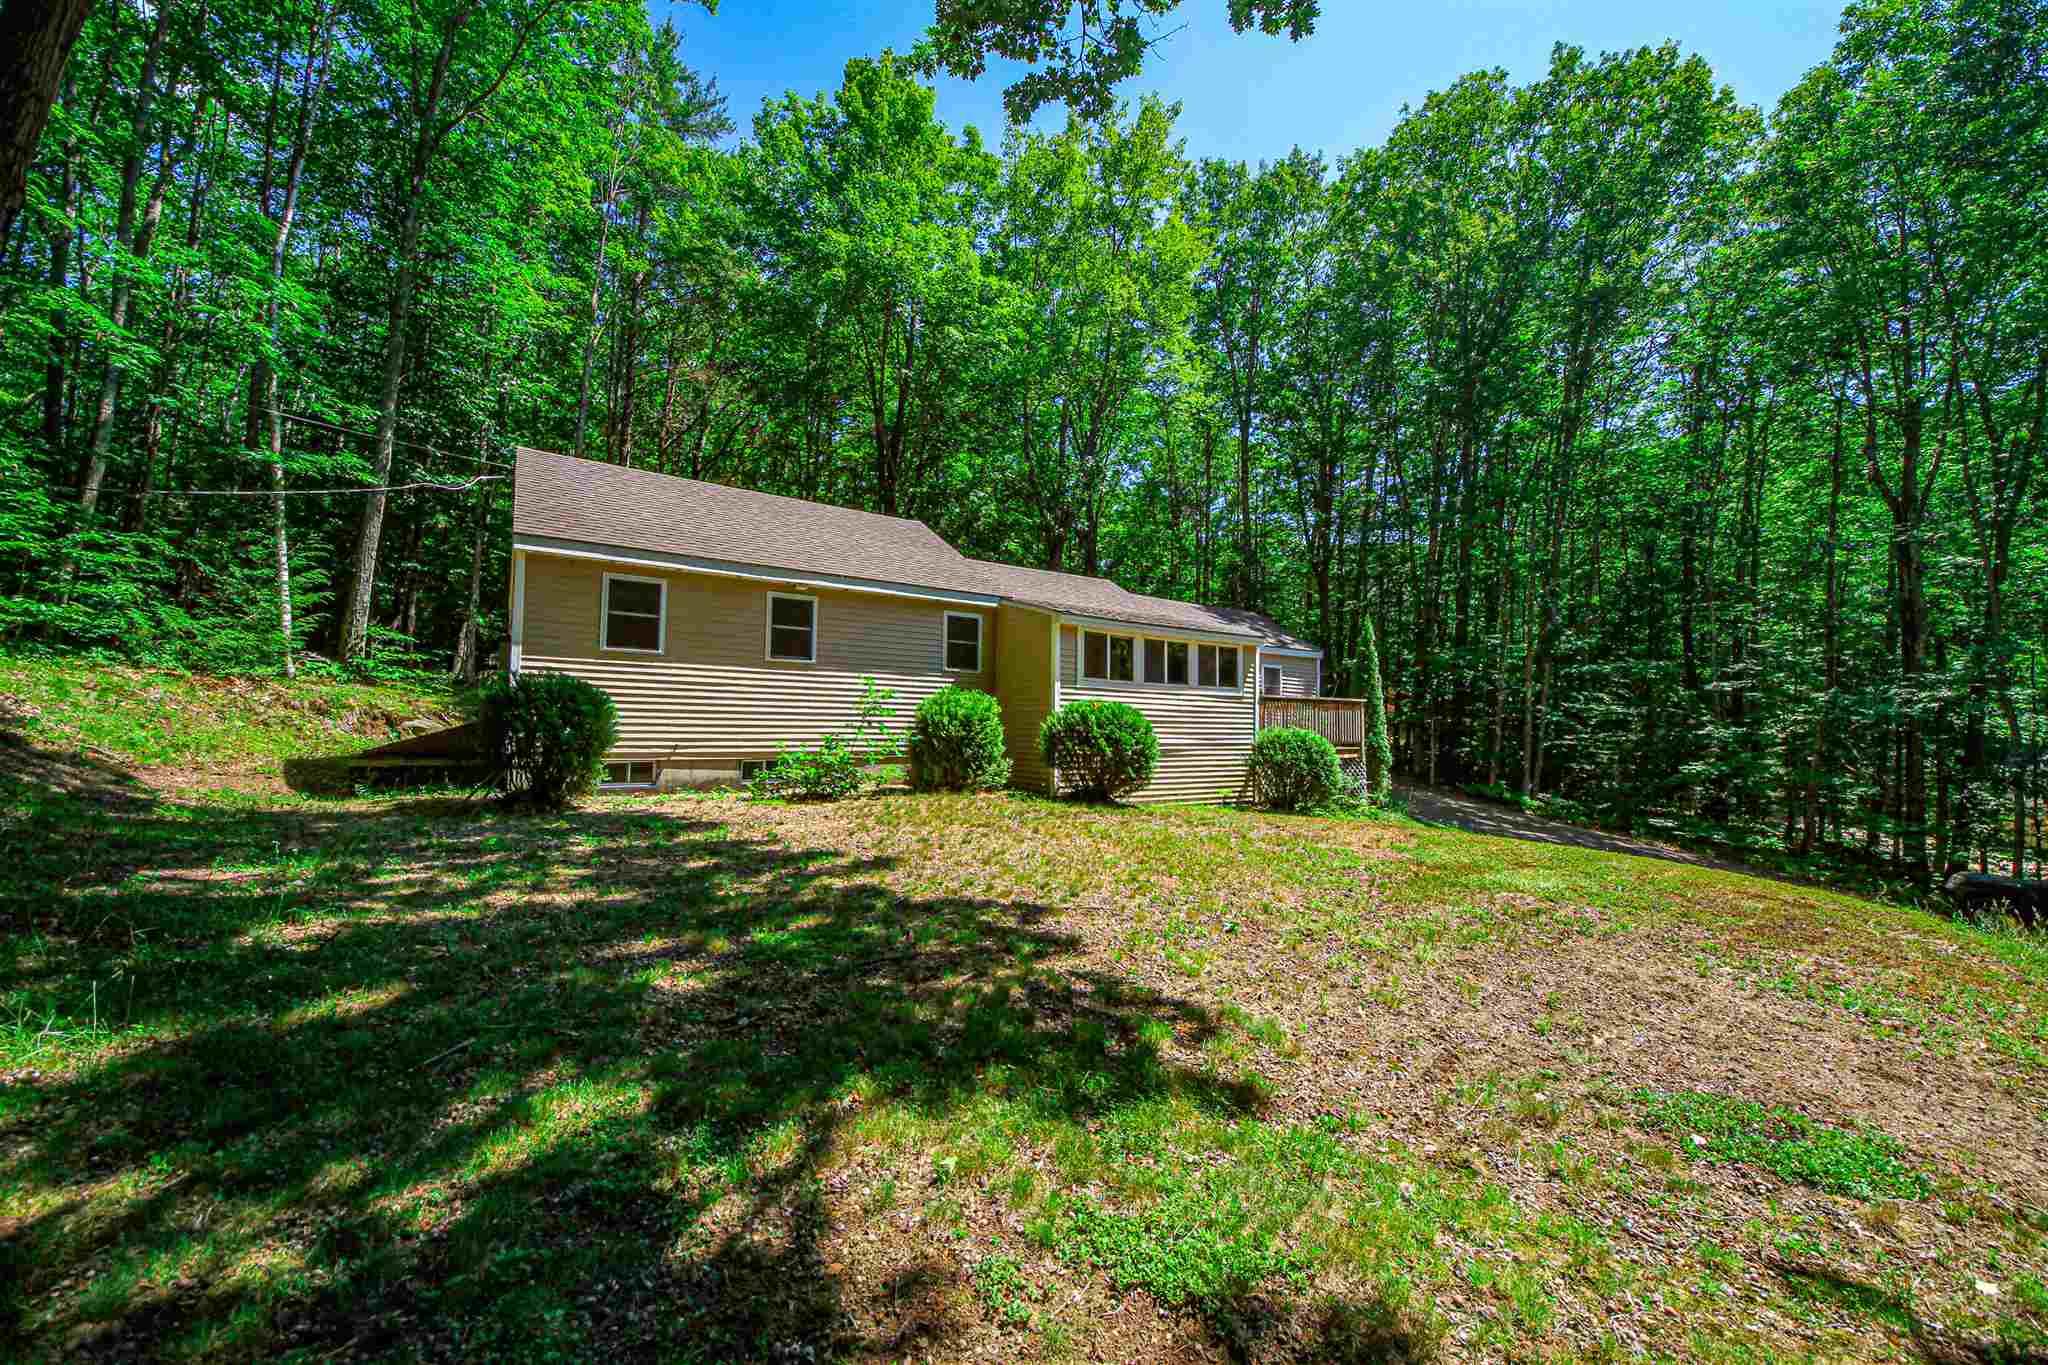 Photo of 17 Ledge Hill Road Tuftonboro NH 03816